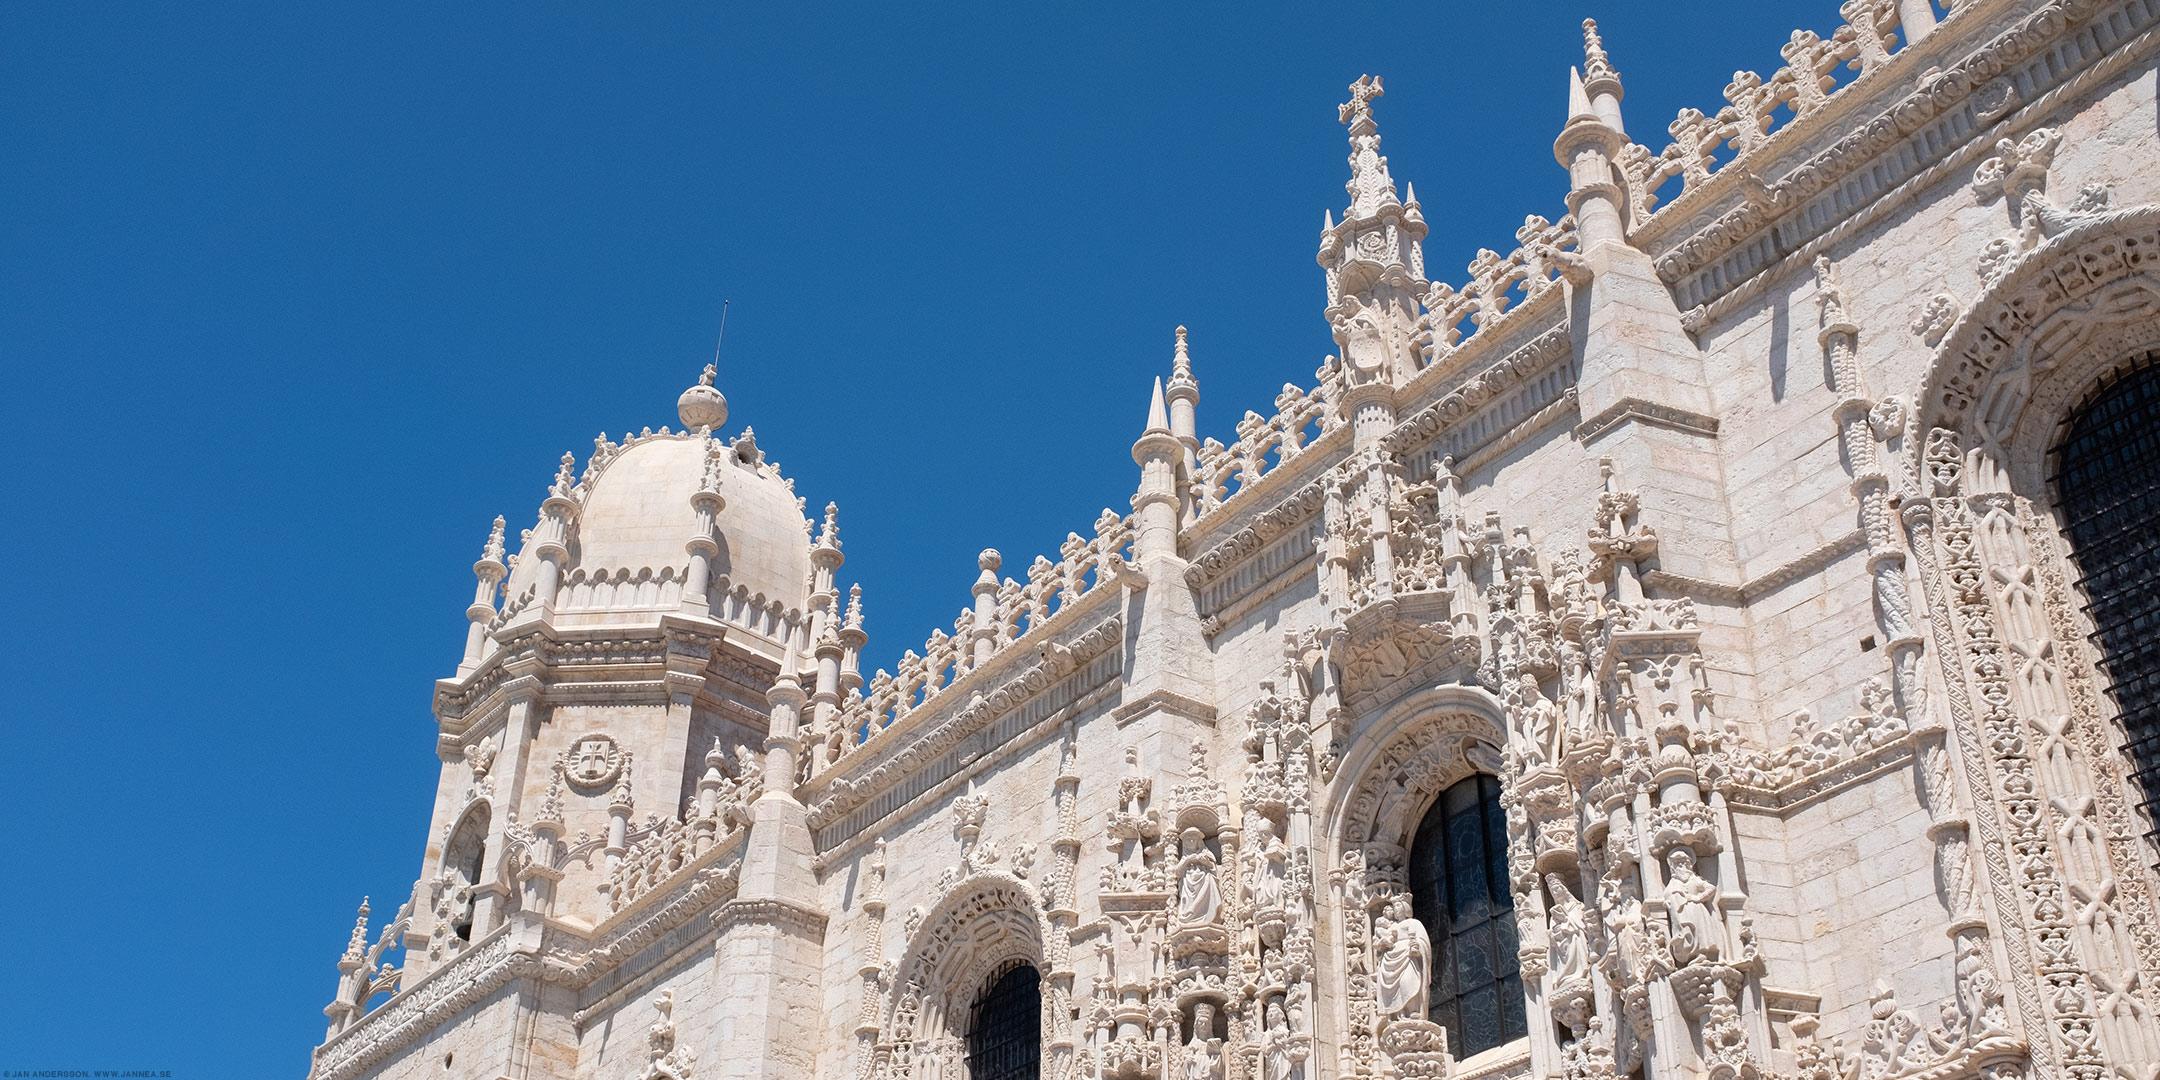 Mosteiro dos Jerónimos, Lissabon |©Jan Andersson